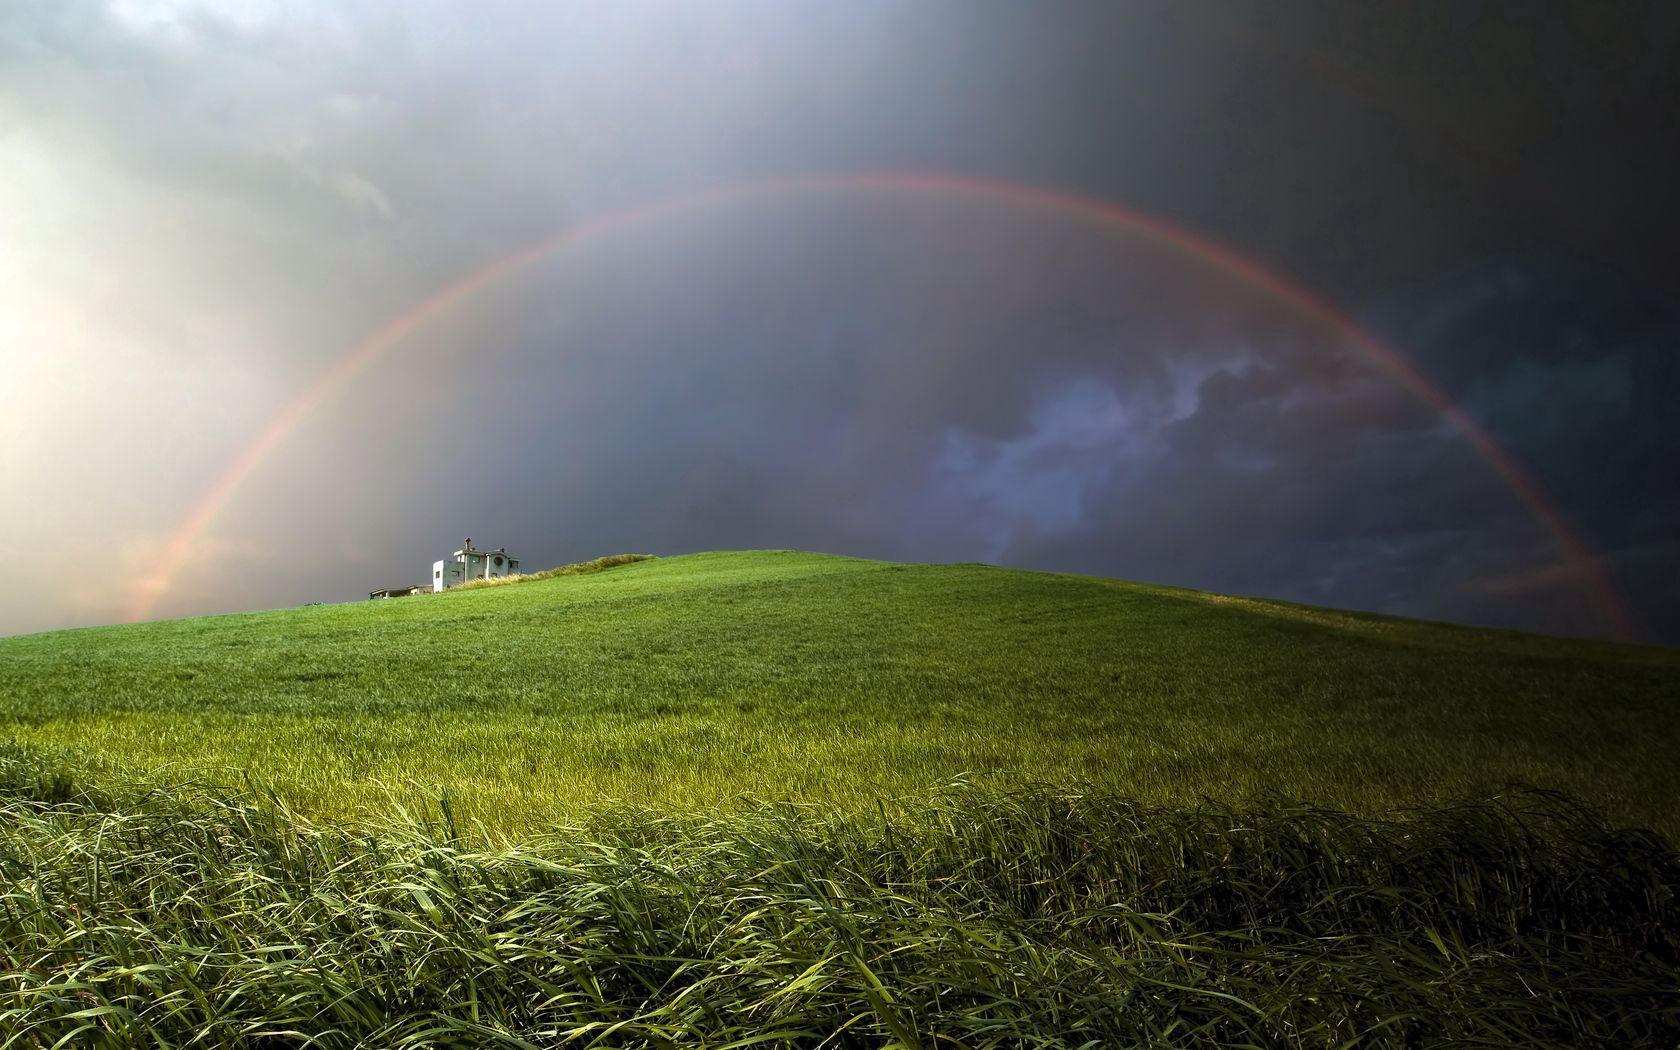 128743 descargar fondo de pantalla Naturaleza, Arco Iris, Nubes, Cerro, Loma, Principalmente Nublado, Nublado, Prado: protectores de pantalla e imágenes gratis